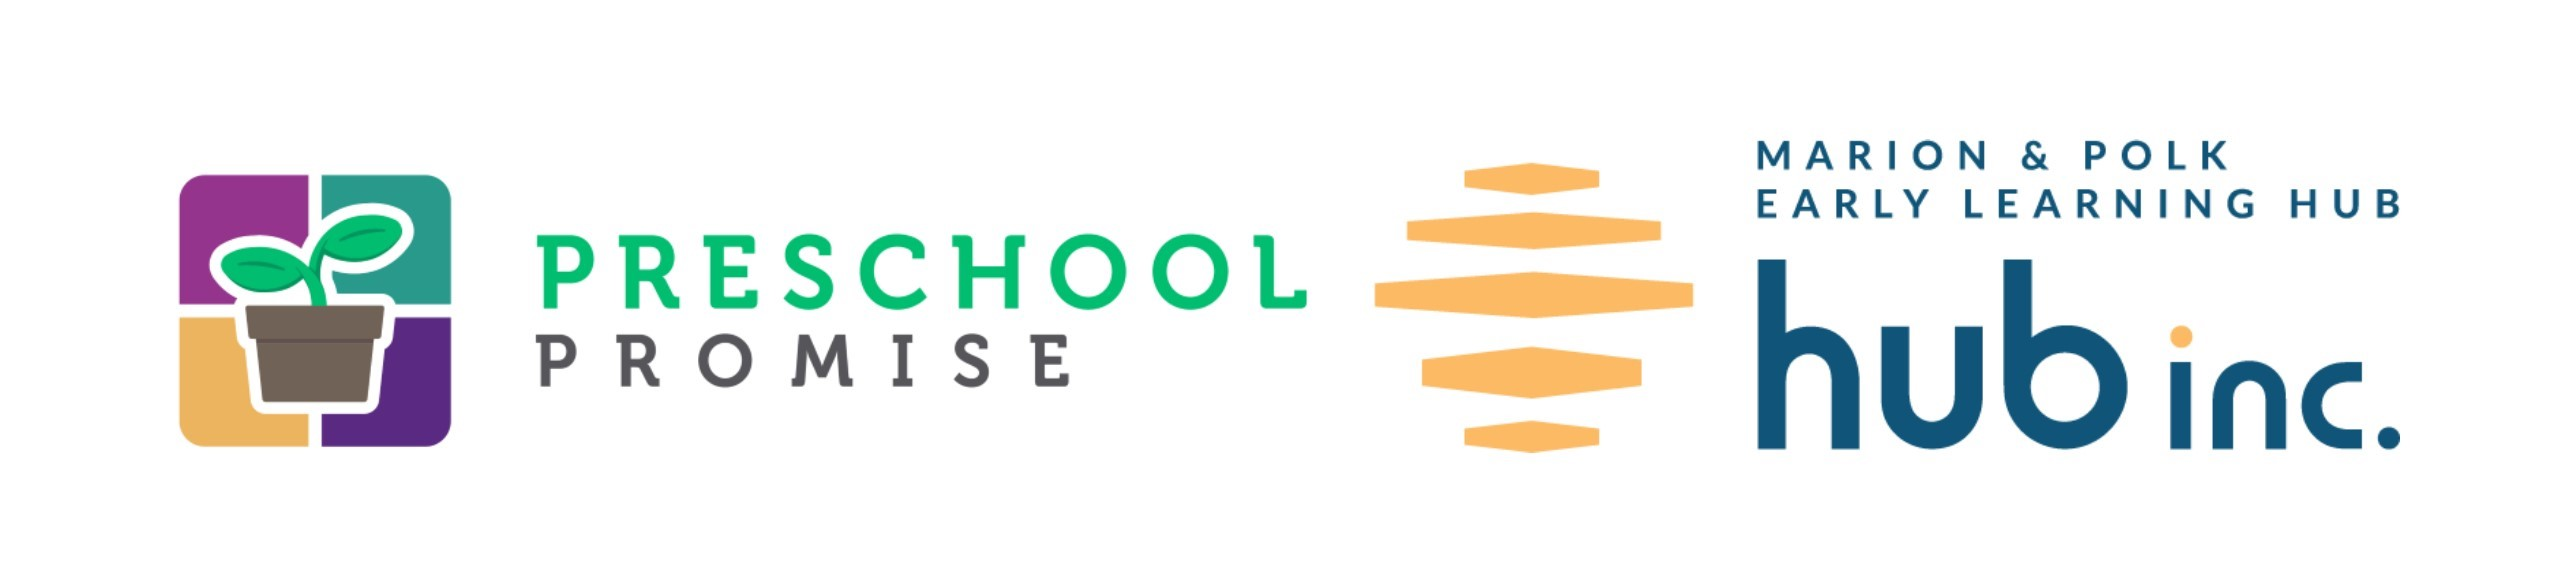 Marion & Polk Early Learning Hub logo